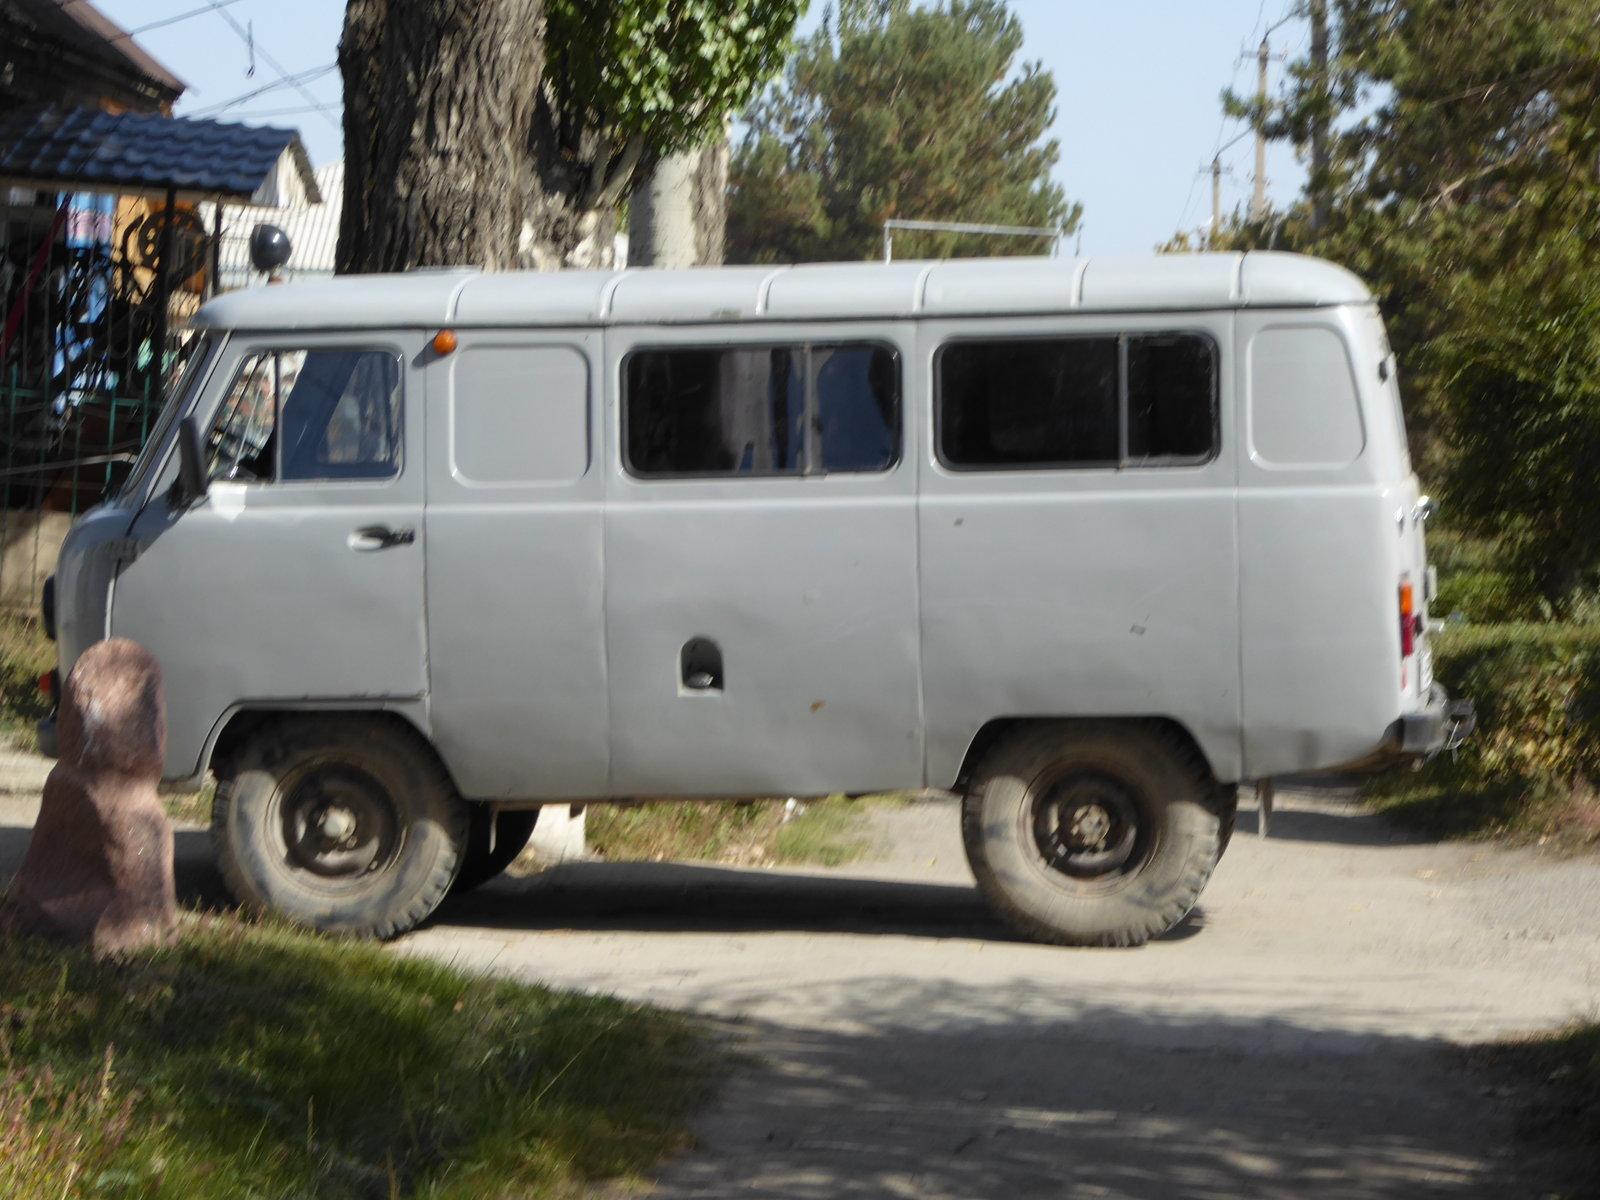 P1000985.JPG